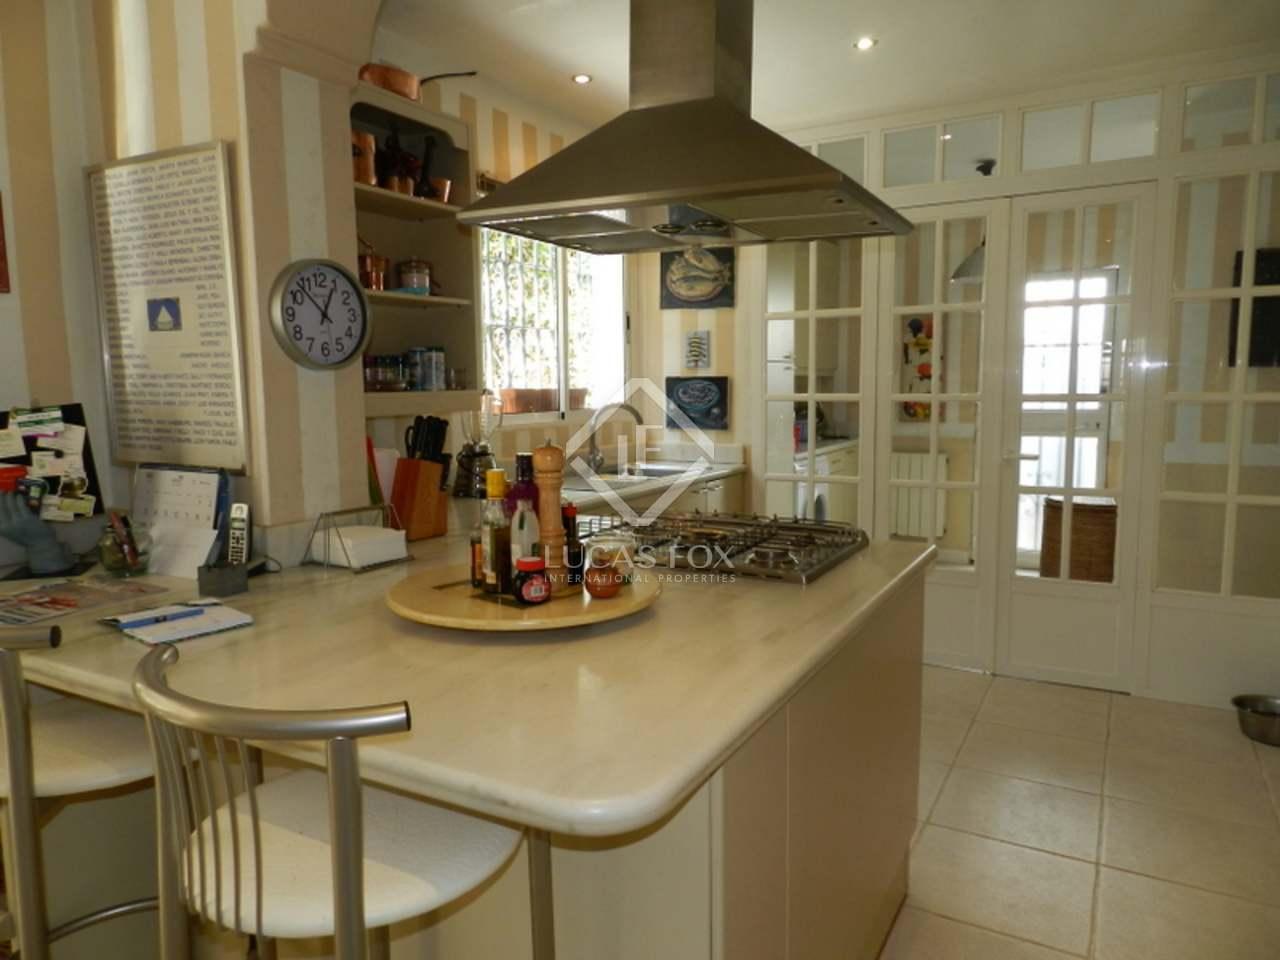 Kitchen - 4 Bed Villa Guadalmina Baja, Marbella